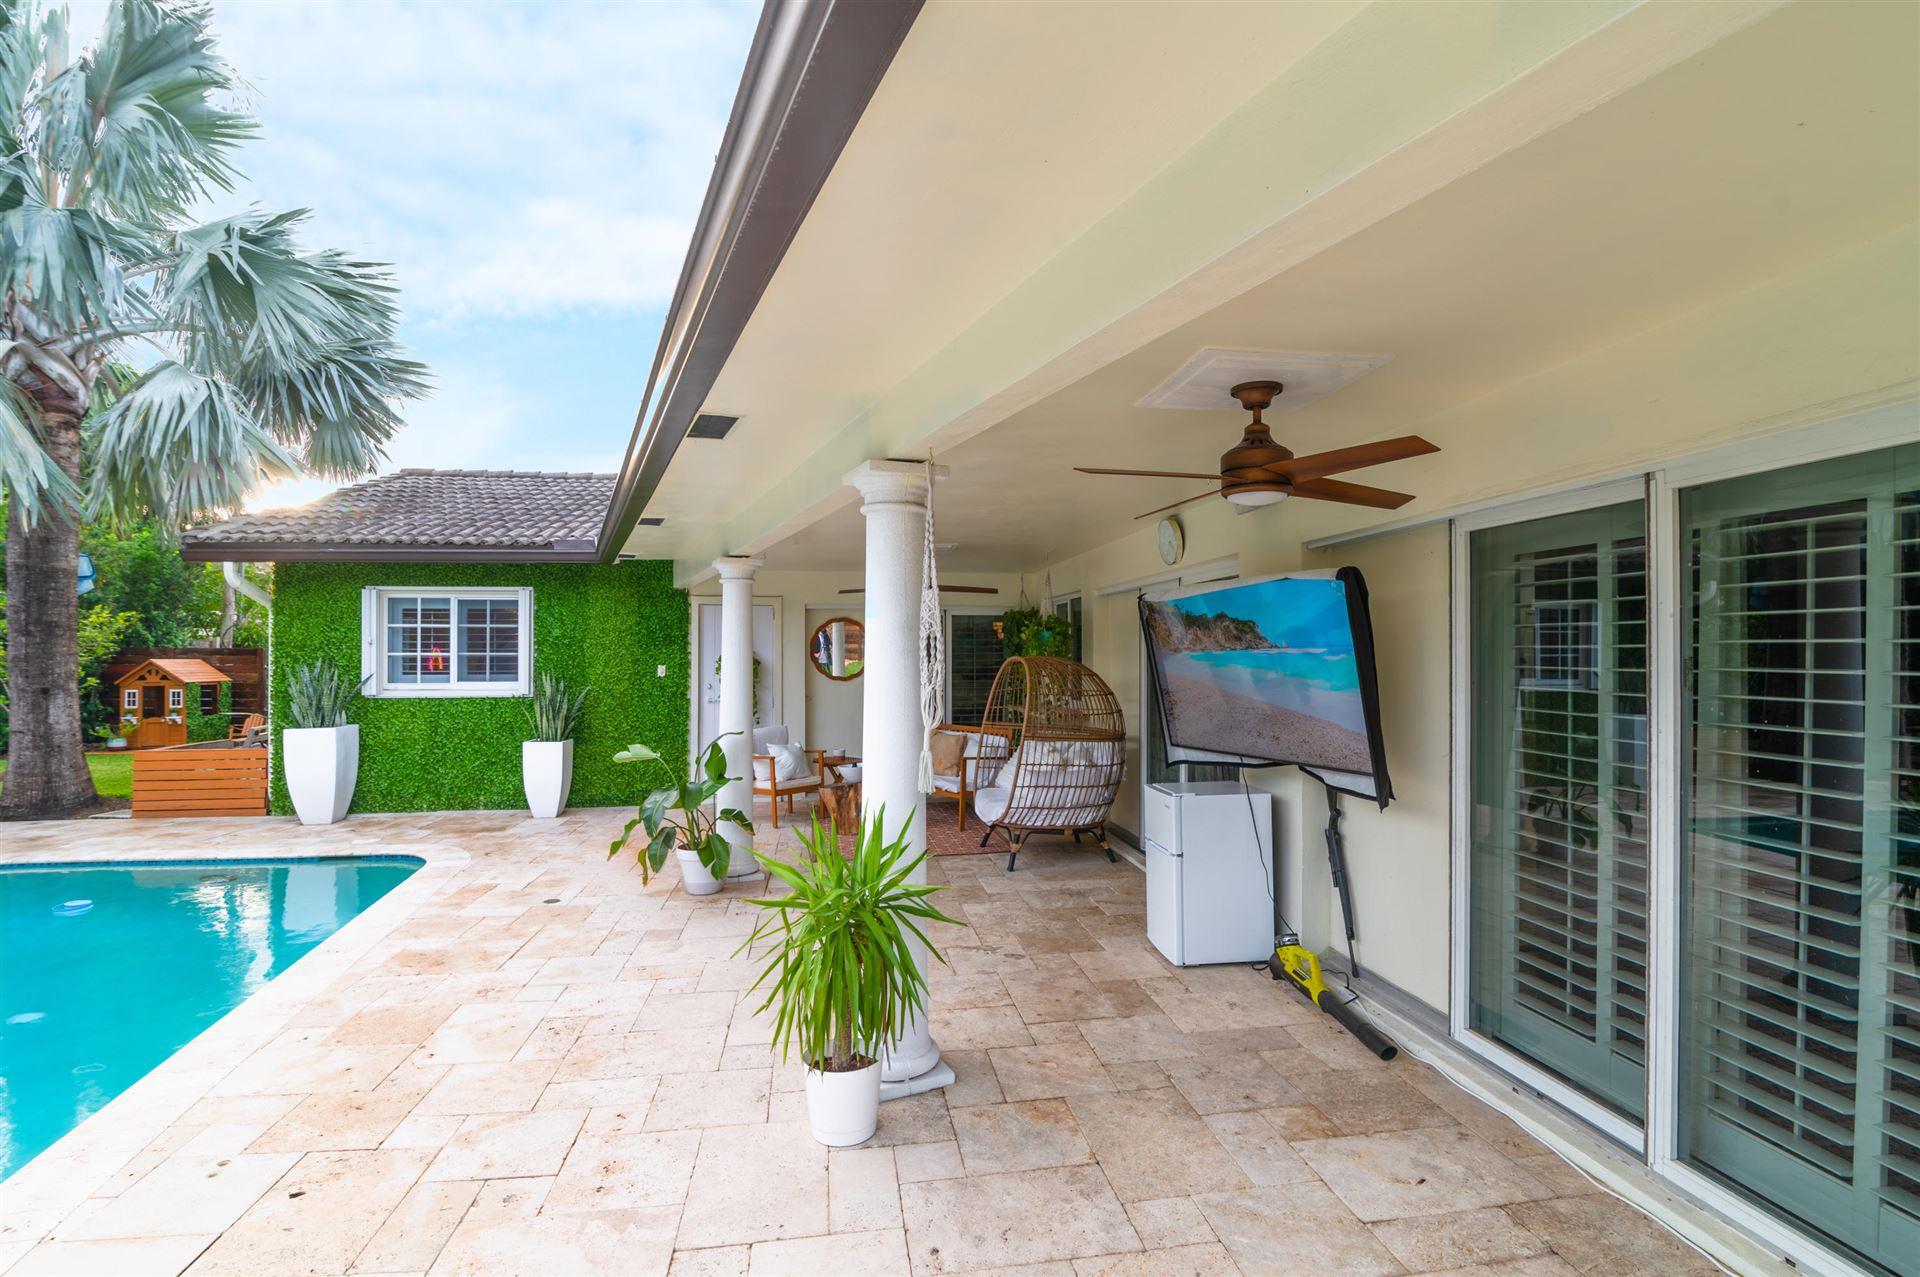 1502 NW 5th Street, Boca Raton, FL 33486 - #: RX-10673406